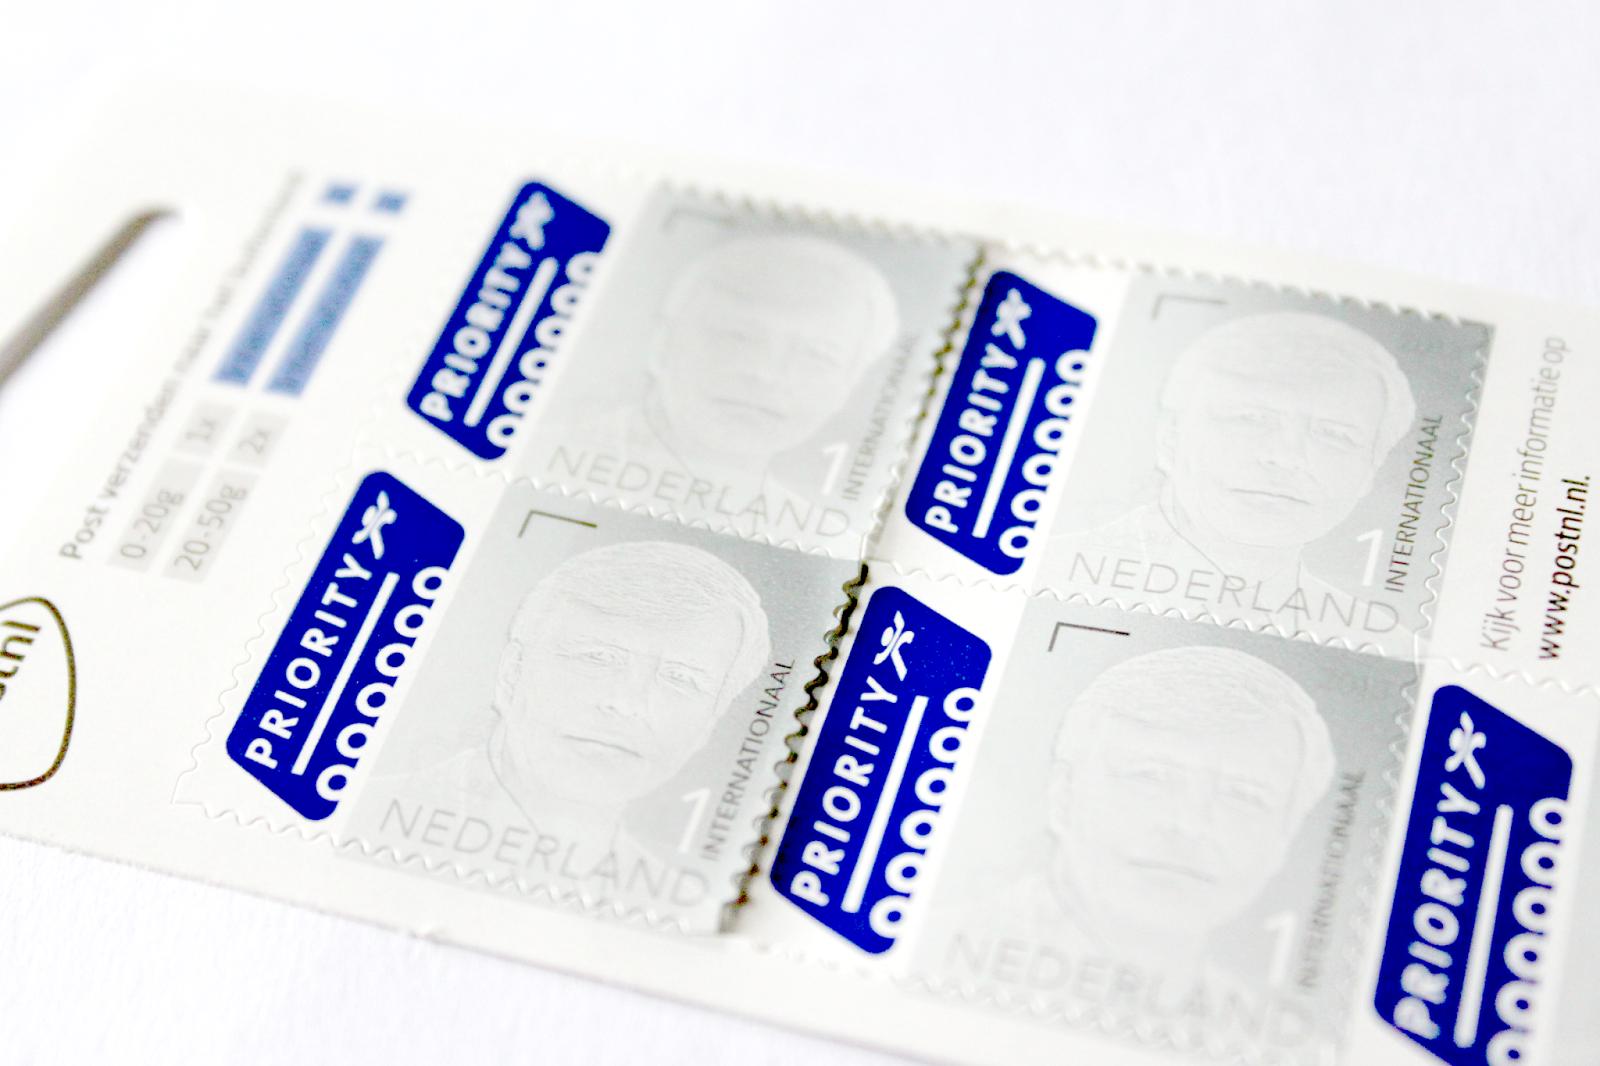 znaczki z holenderskim królem